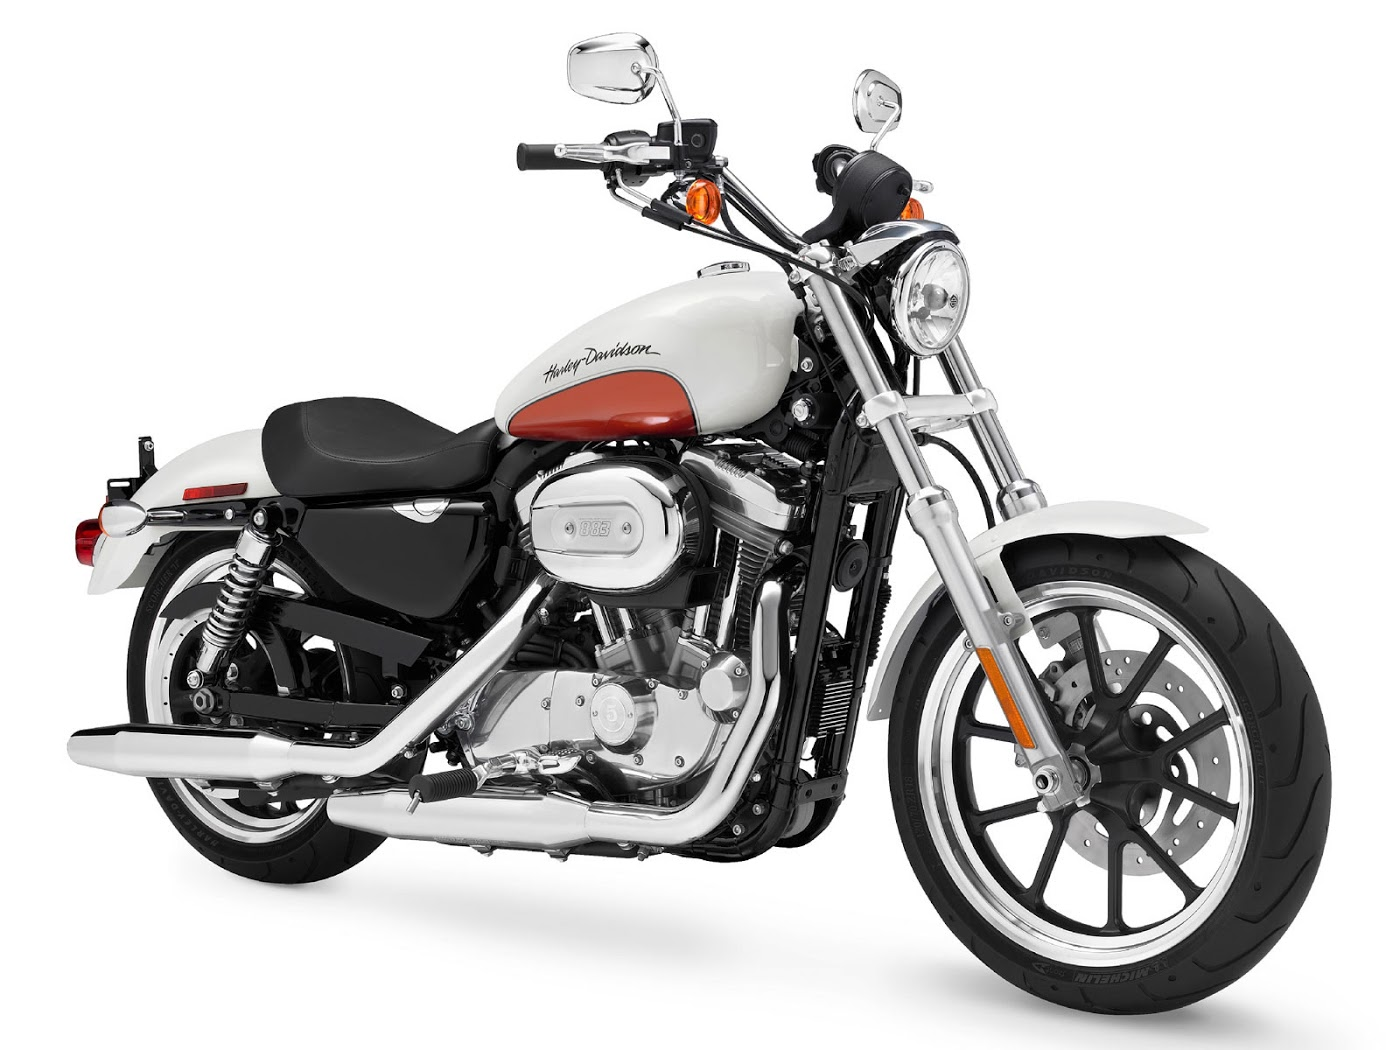 Harley Davidson XL 883 Sportster SuperLow   Harley Davidson Wallpaper 1400x1050